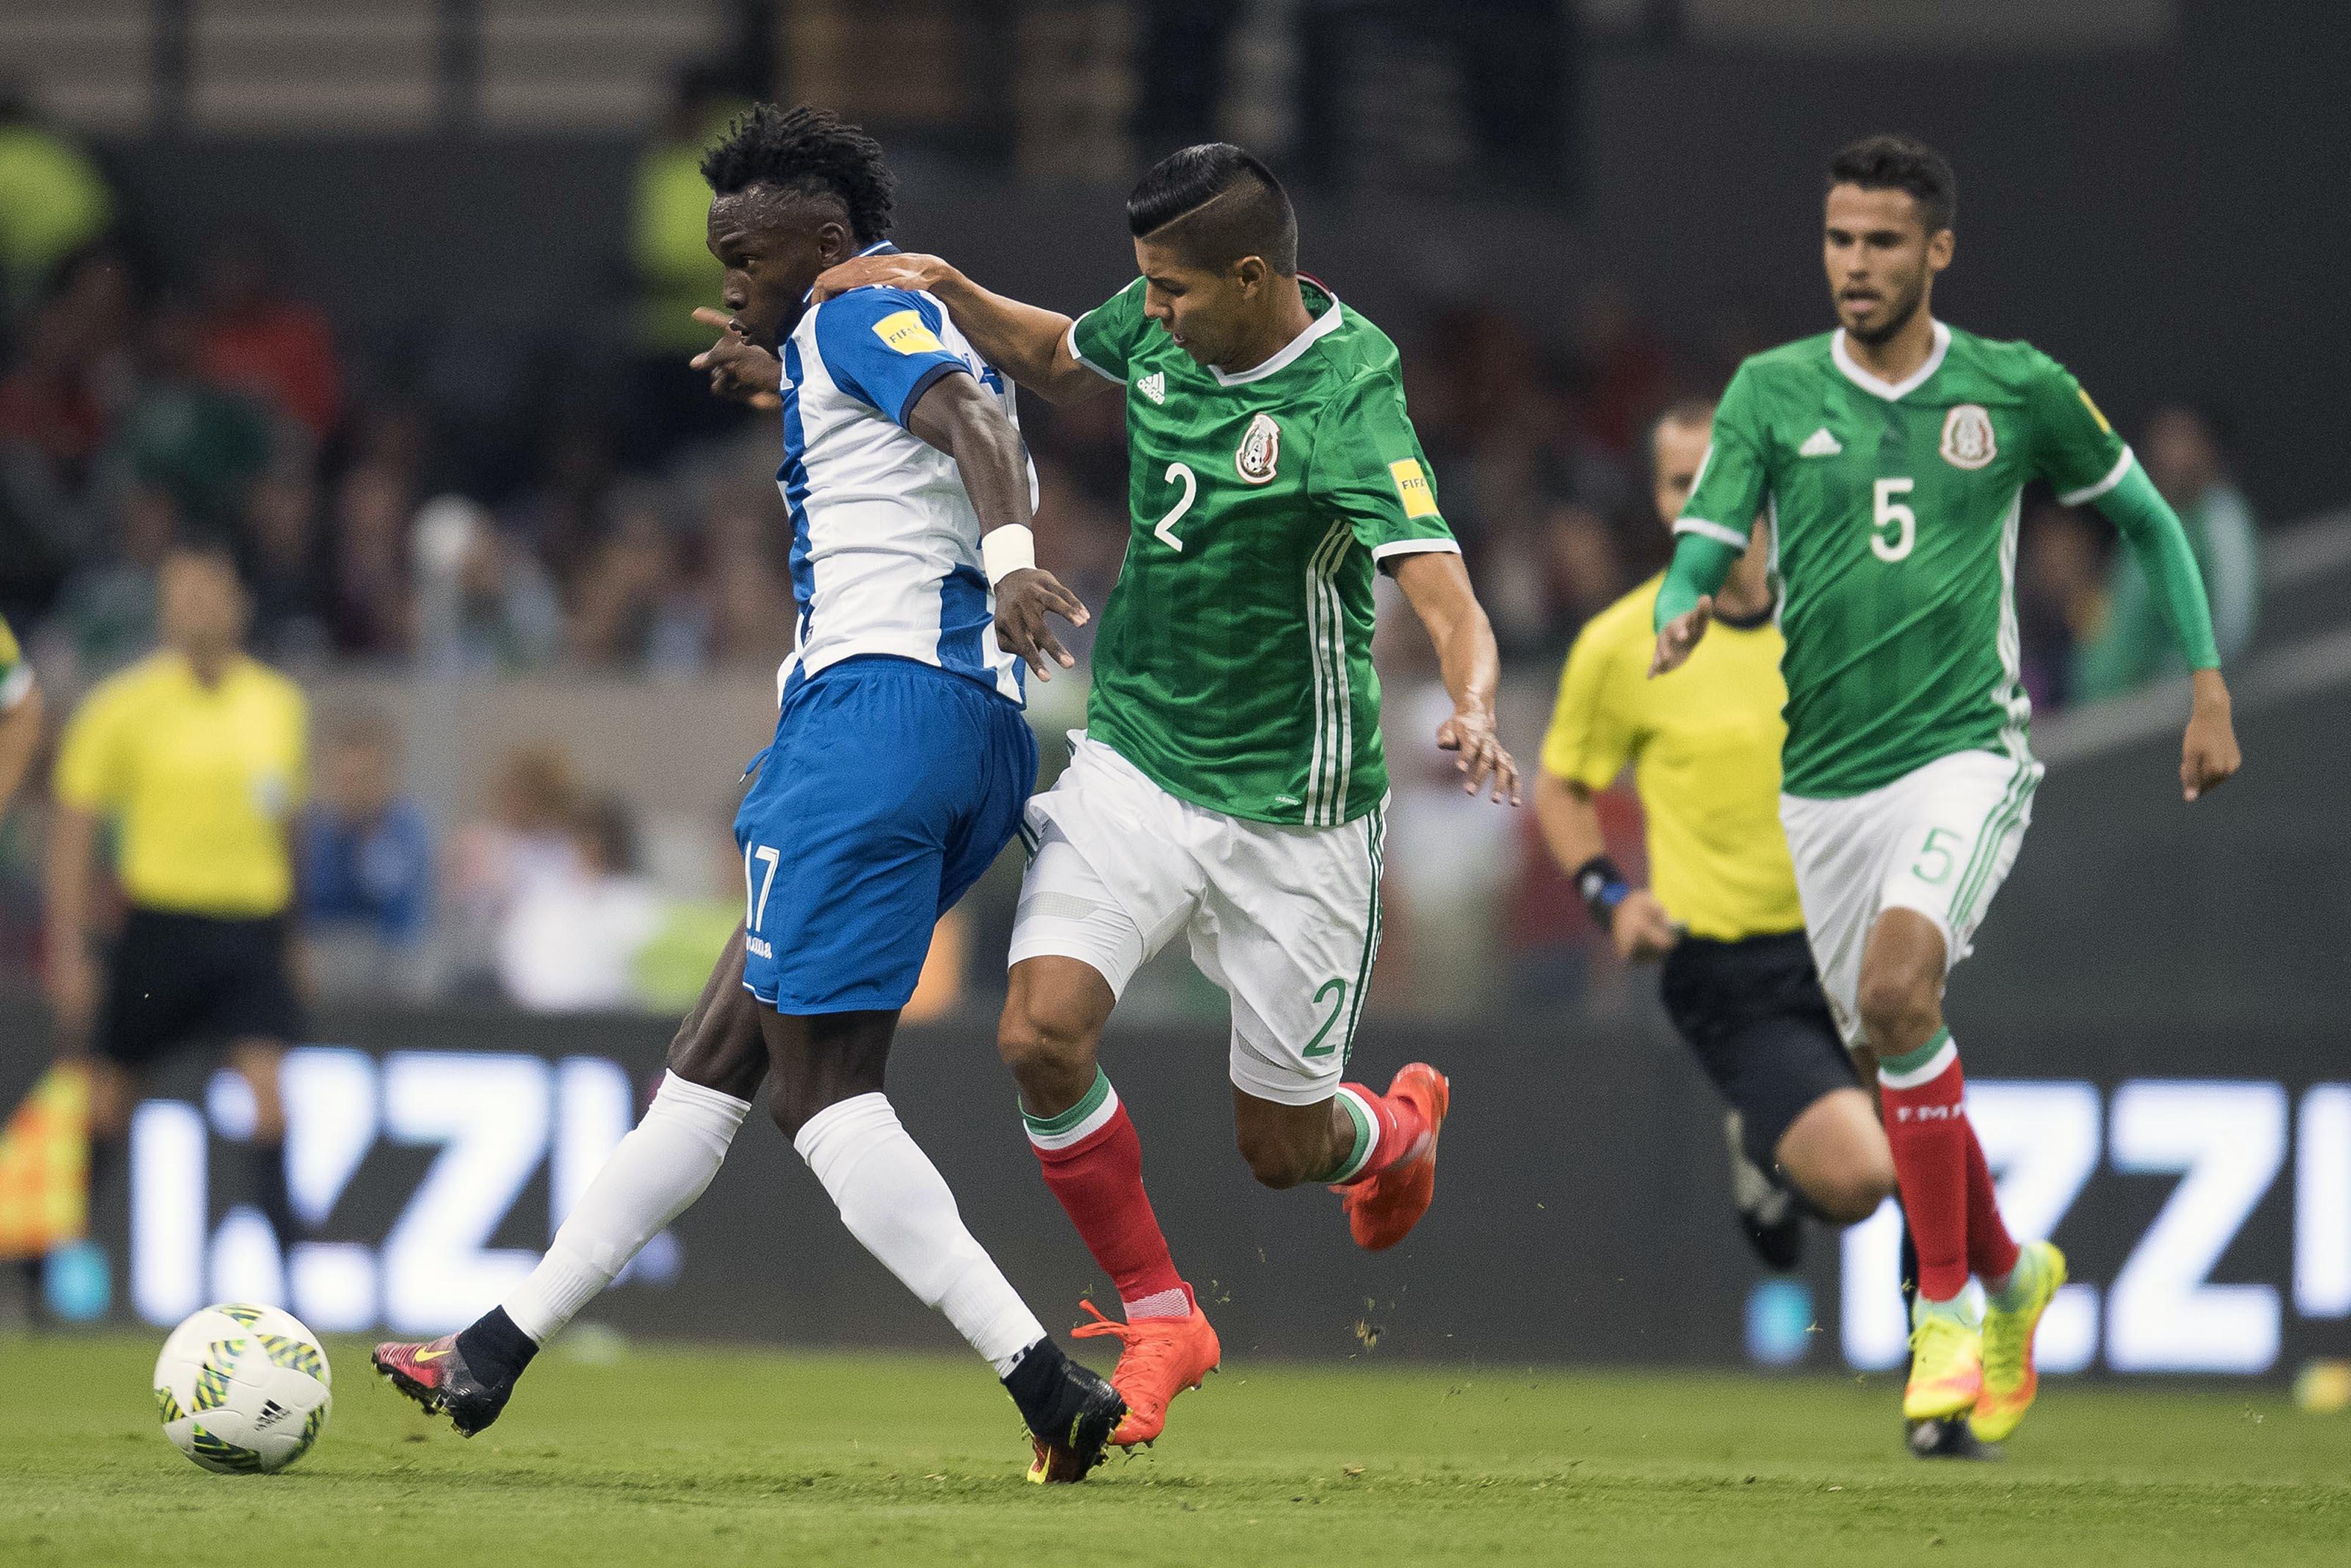 México intentará conseguir su pase a semifinales